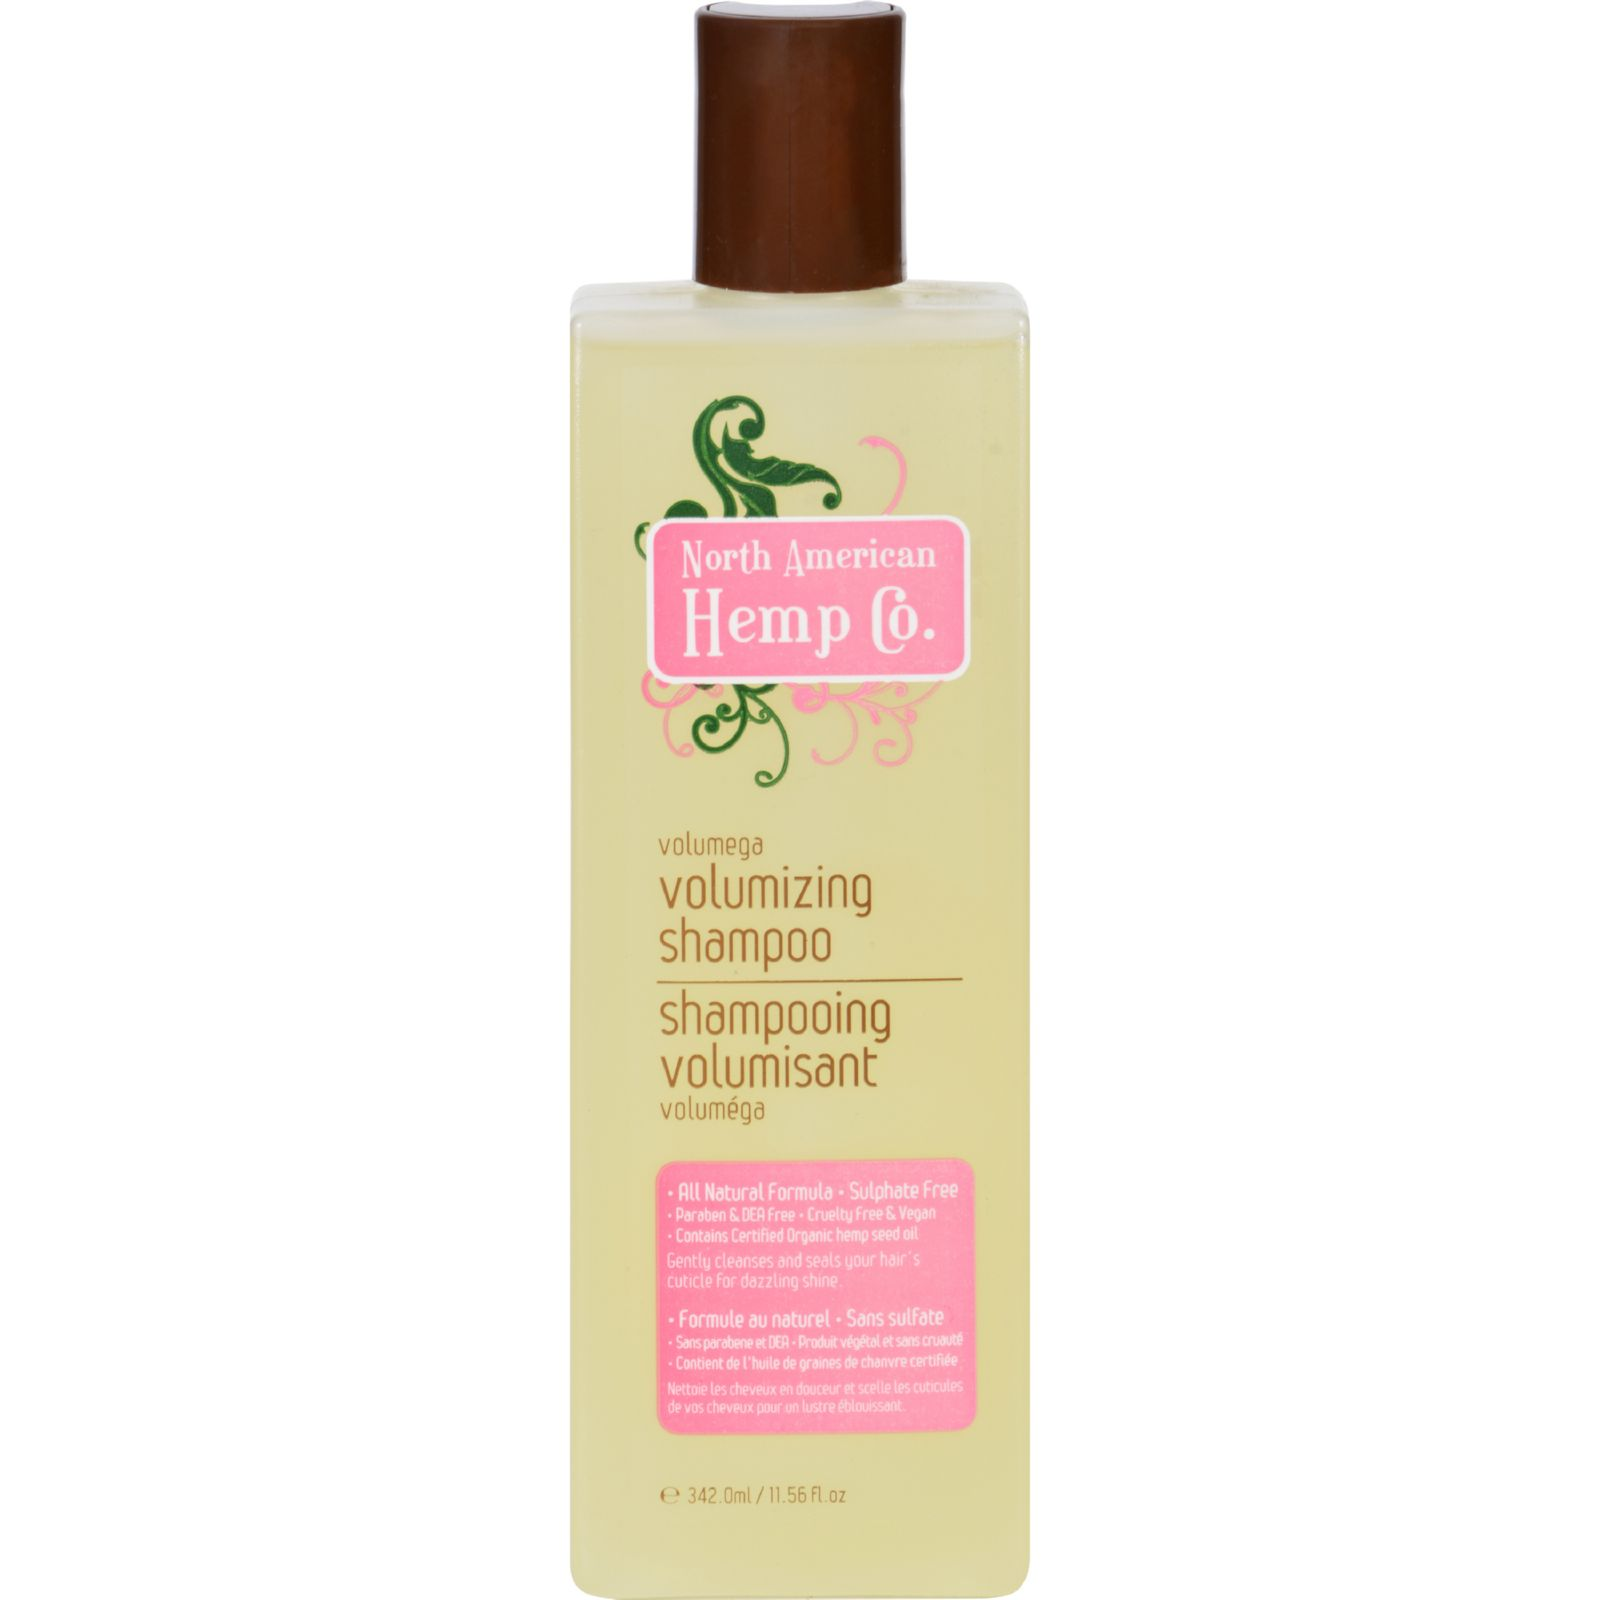 North American Hemp Company Shampoo - Volumizing - 11.56 fl oz